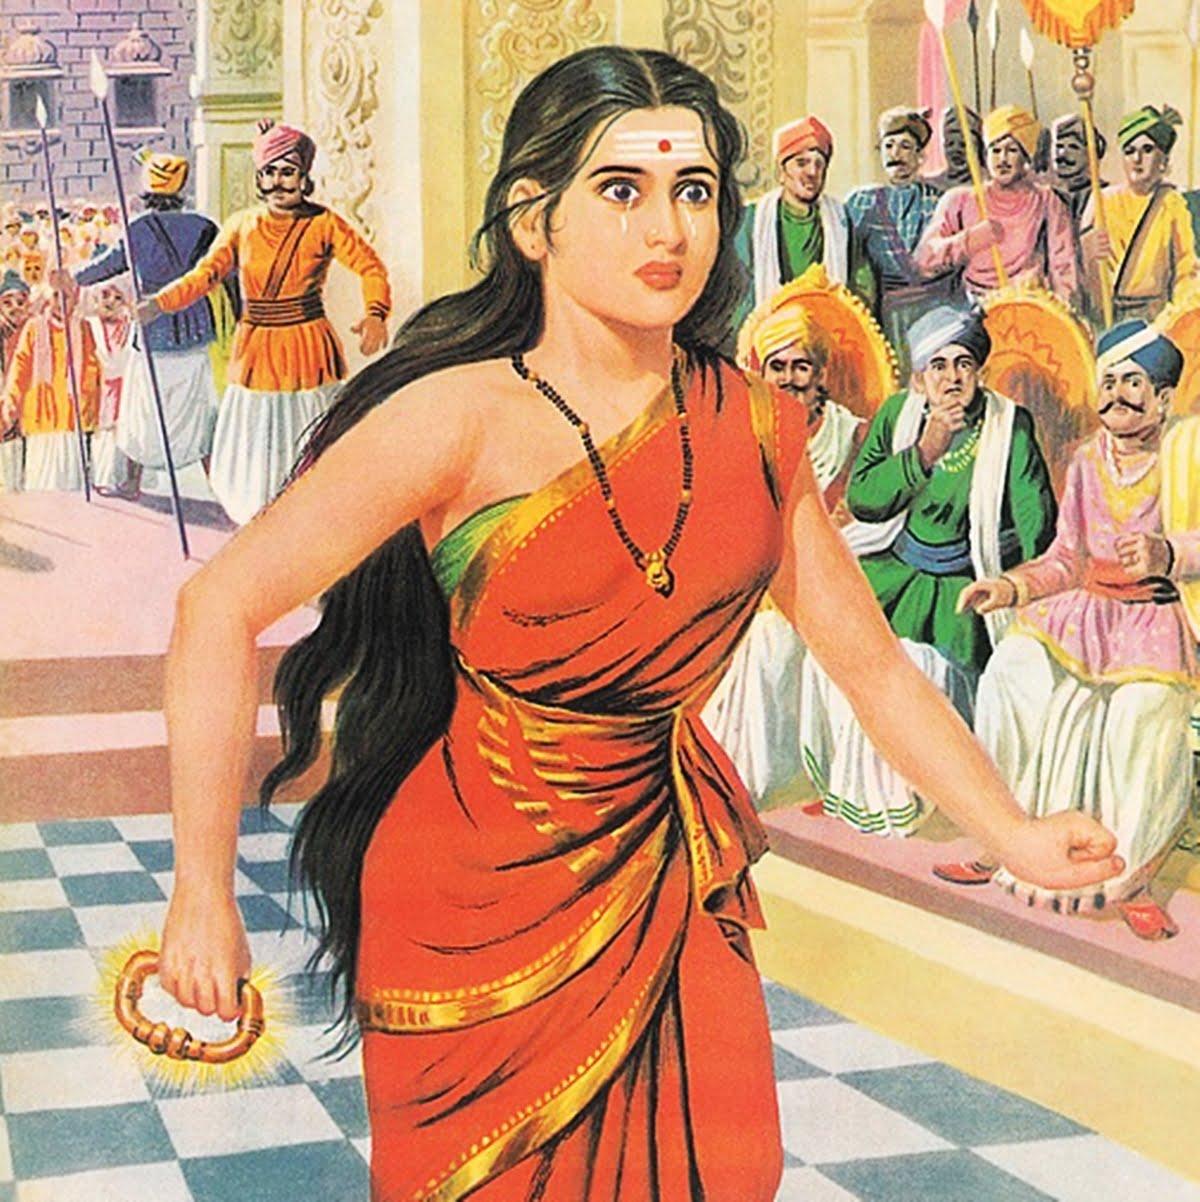 Cilappatikaram And The Idea Of Chastity Embodied By Kannaki